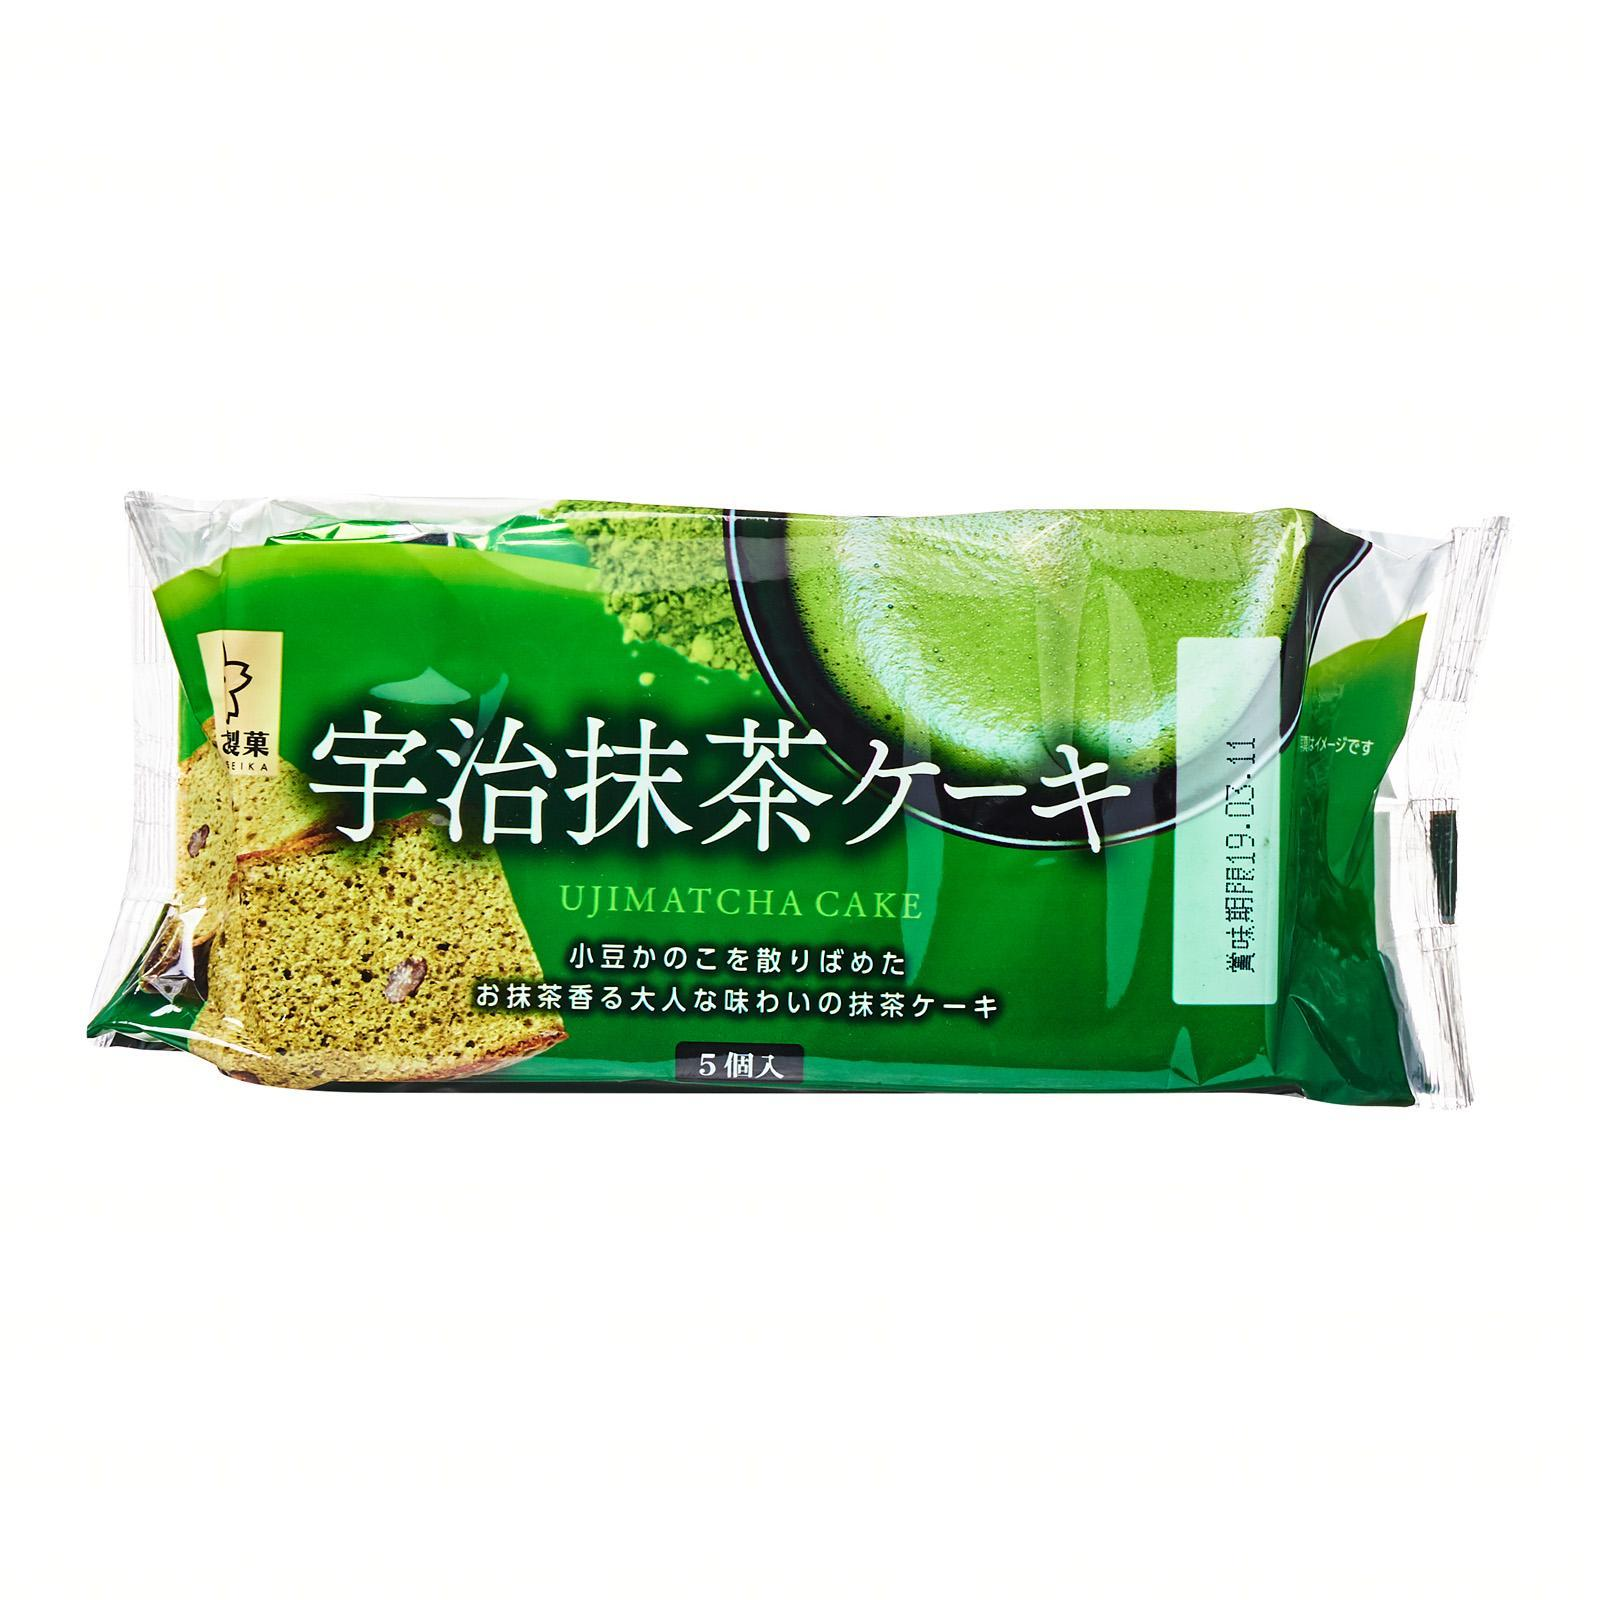 Sunlavieen Uji Matcha Green Tea Cake - Jetro Special